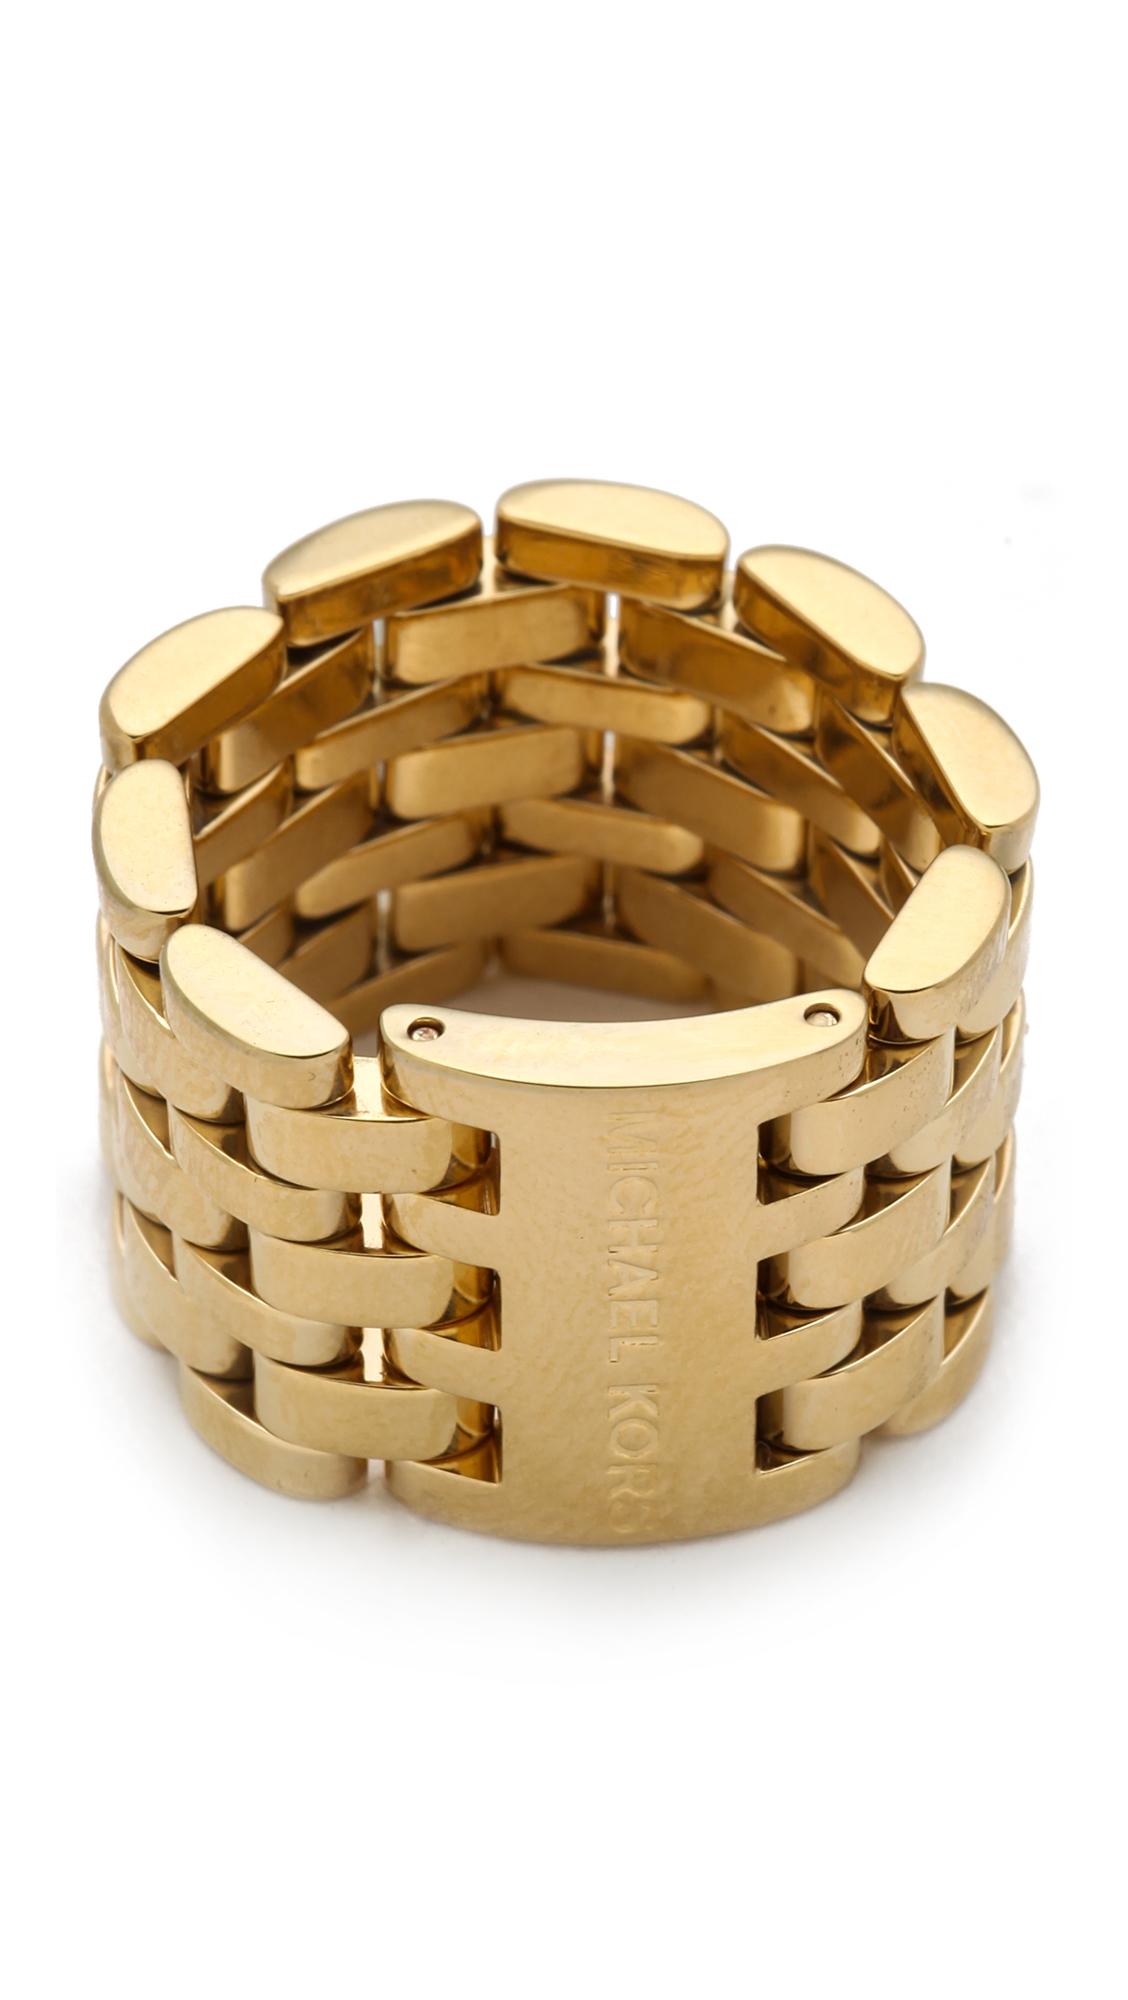 michael kors watch link ring in gold lyst. Black Bedroom Furniture Sets. Home Design Ideas